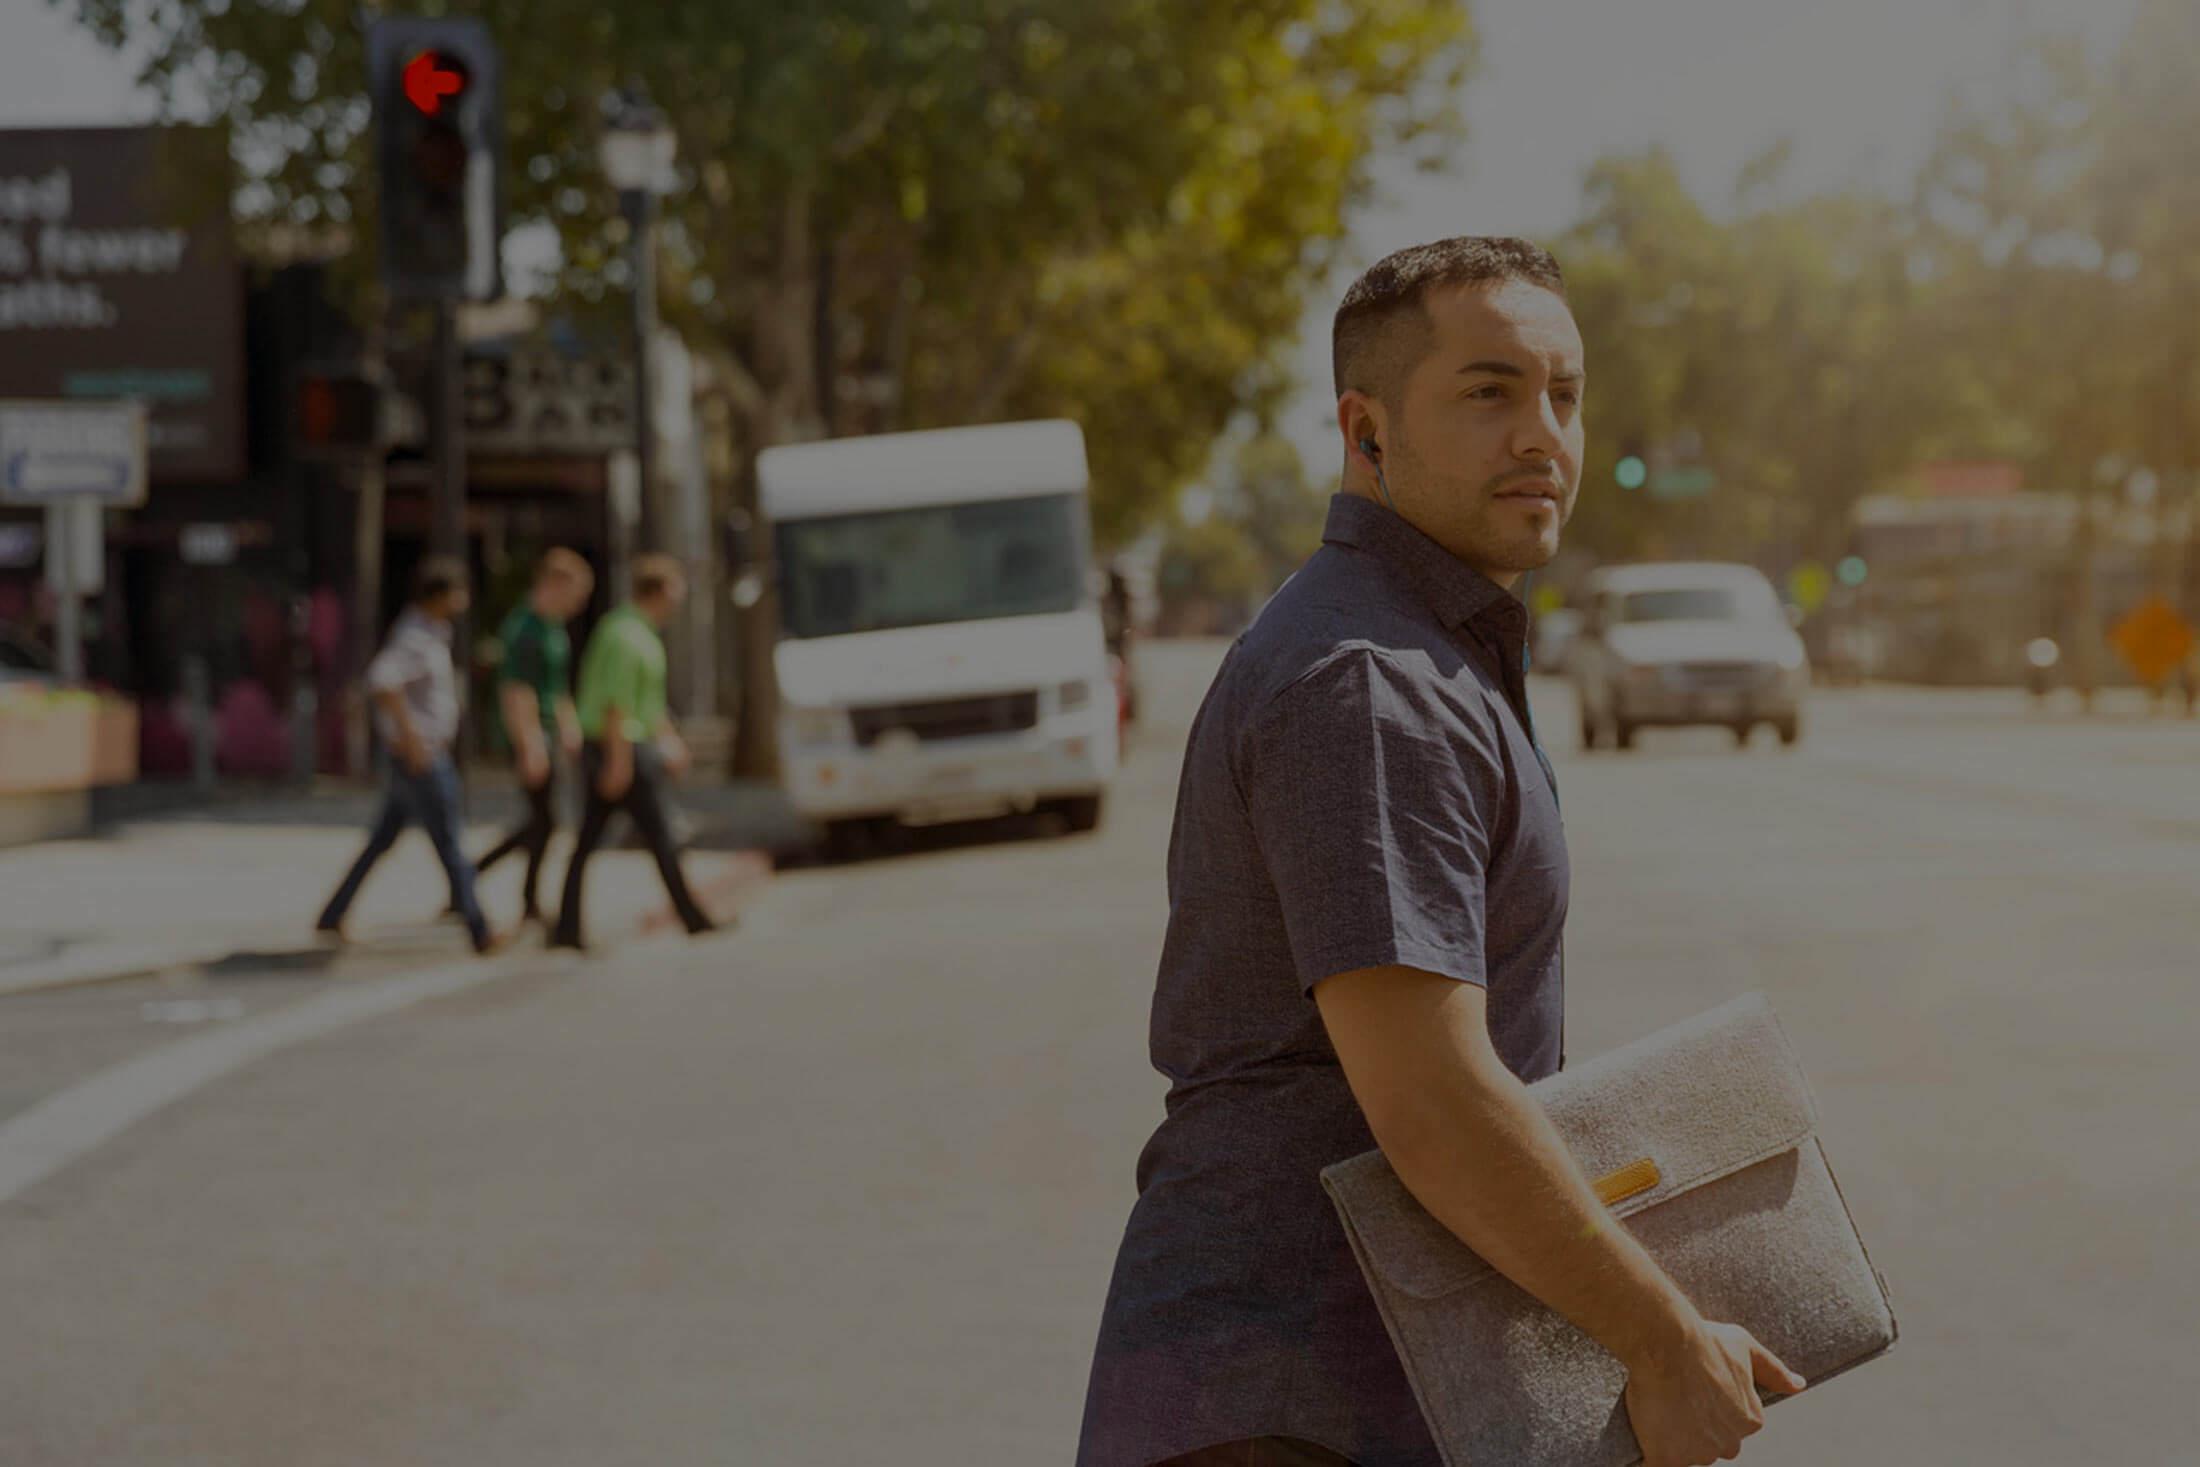 Pole emploi - offre emploi Frigoriste (H/F) - Échirolles